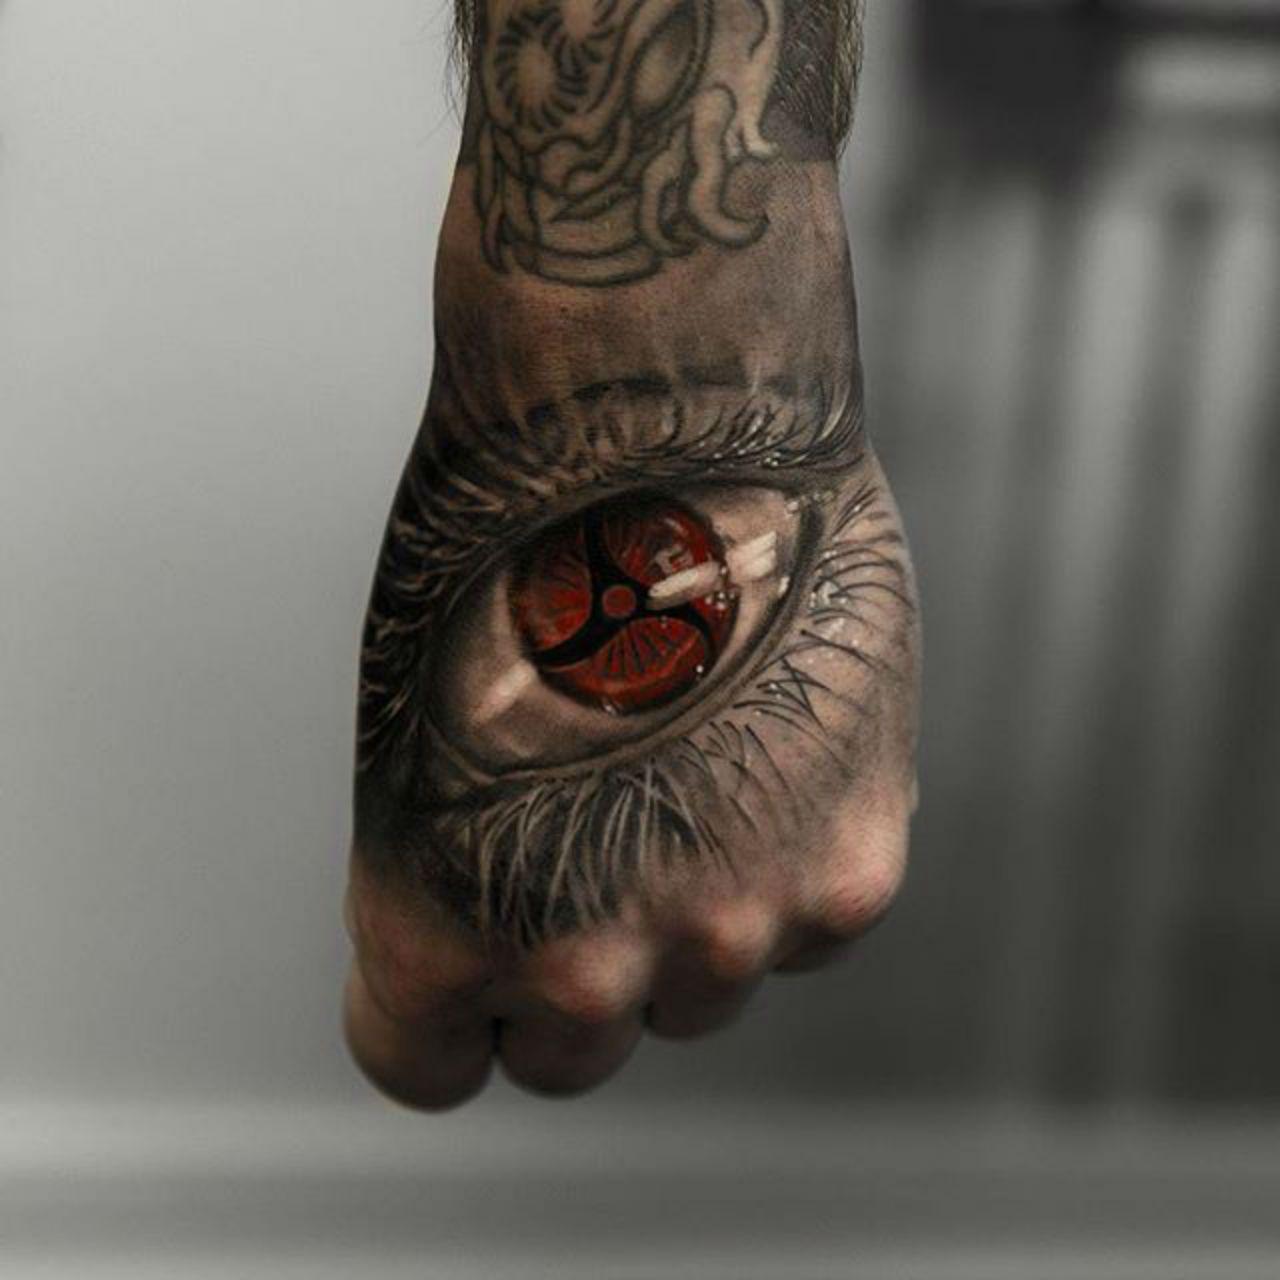 Niki Norberg Eyes Are The Soul Tatouage Tatouage Bras Idee Tattoo